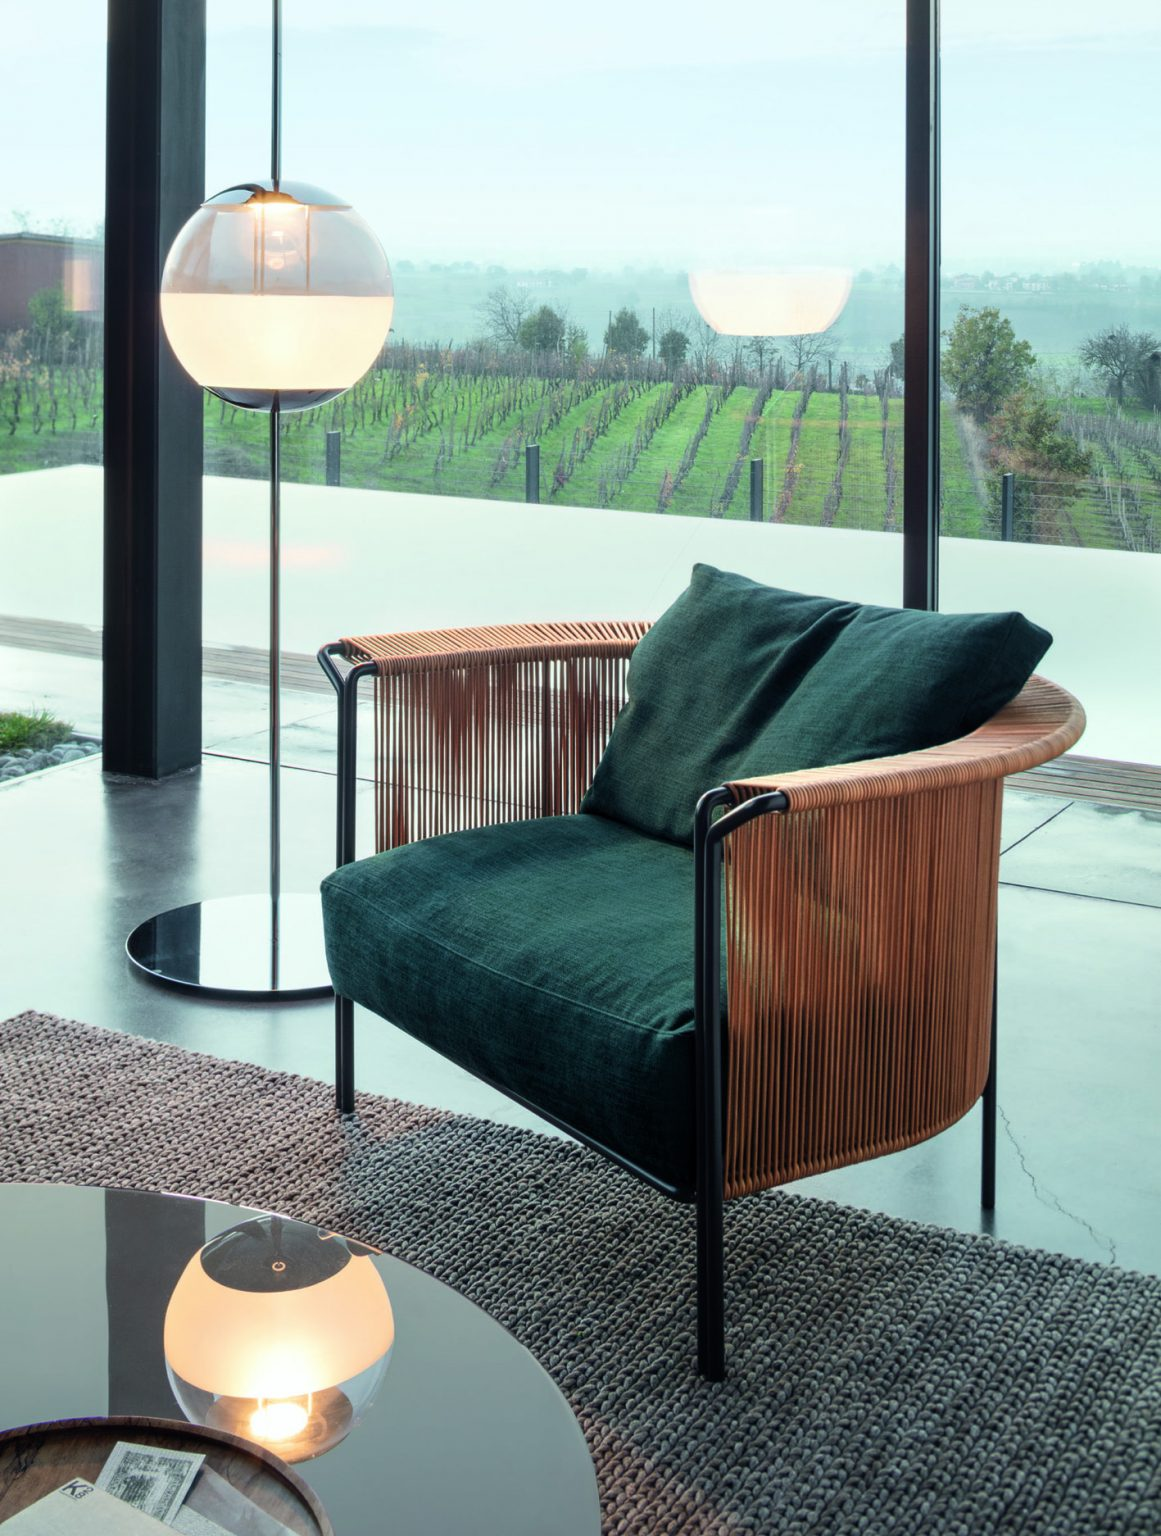 Biennale Interieur - Belgium's leading design and interior event - Lema-alton-david-lopez-quincoces-1.jpg